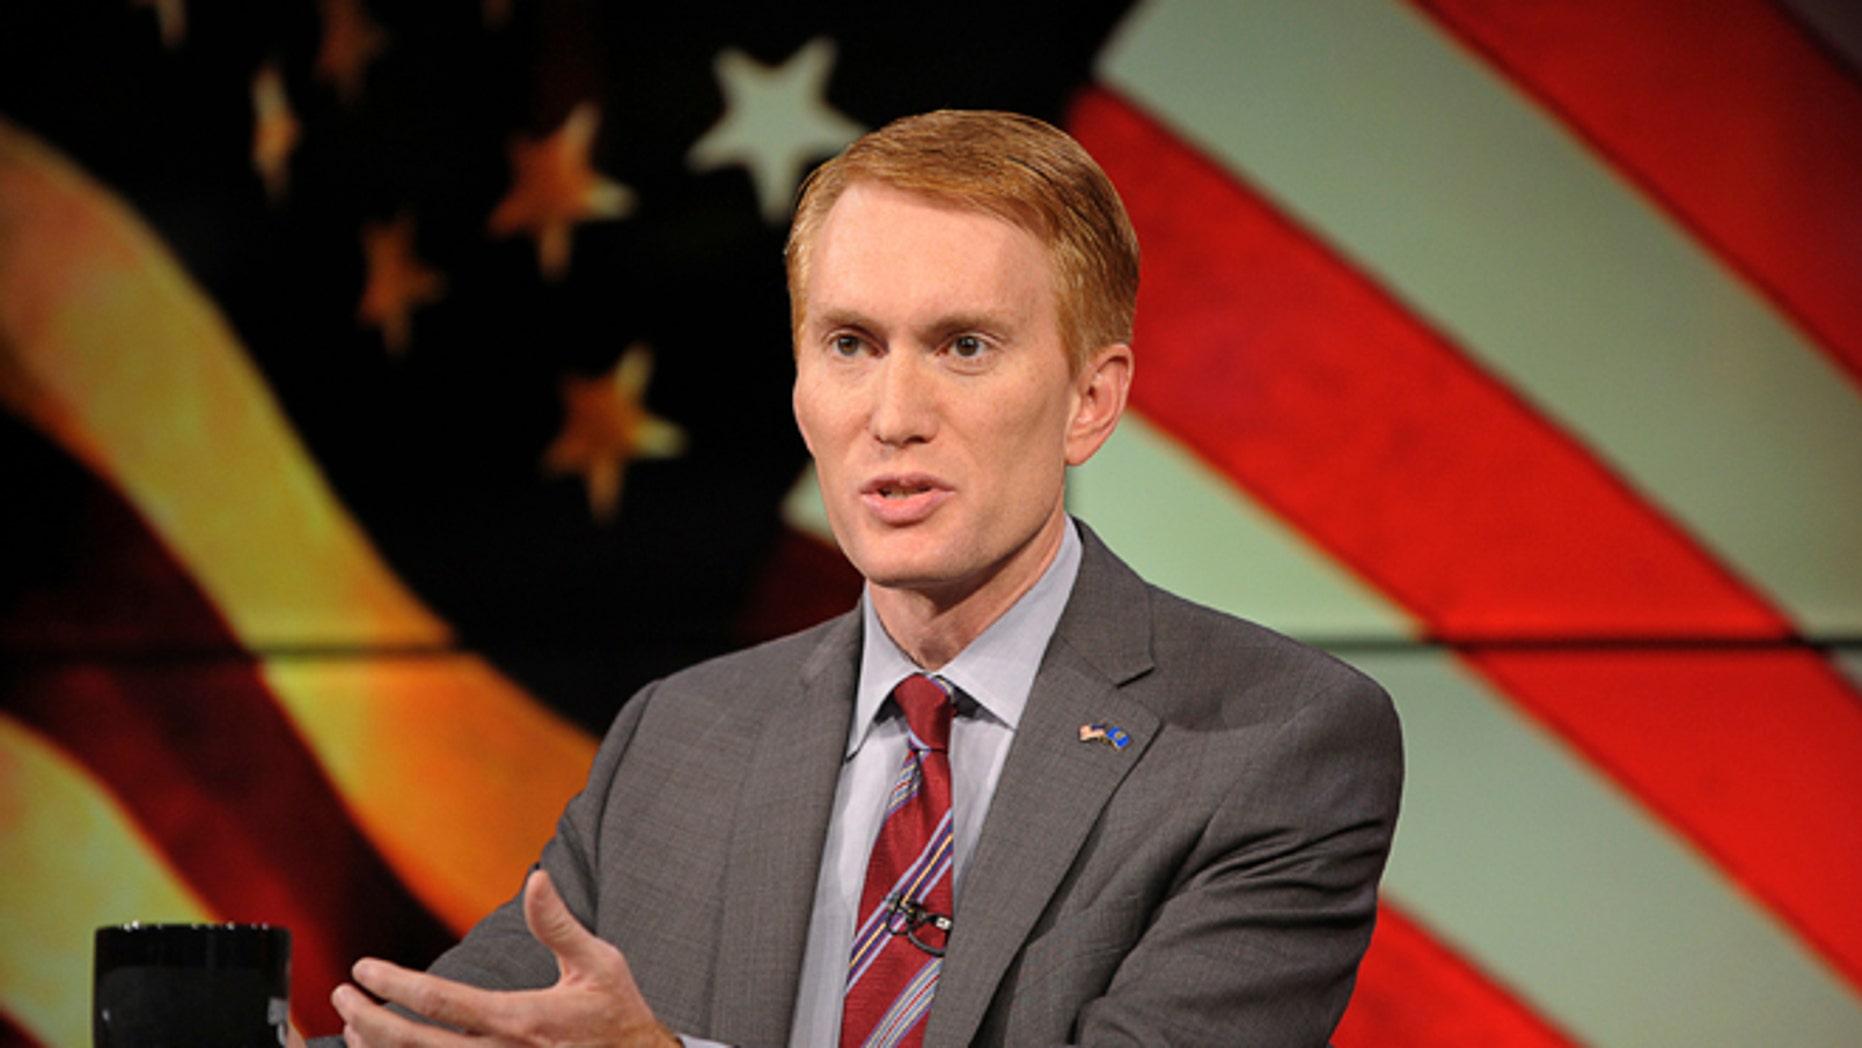 Congressman James Lankford (R) participates in the U.S. Senate debate in Tulsa, Oklahoma, June 18, 2014.  REUTERS/Nick Oxford  (UNITED STATES - Tags: POLITICS) - RTR3UJXM